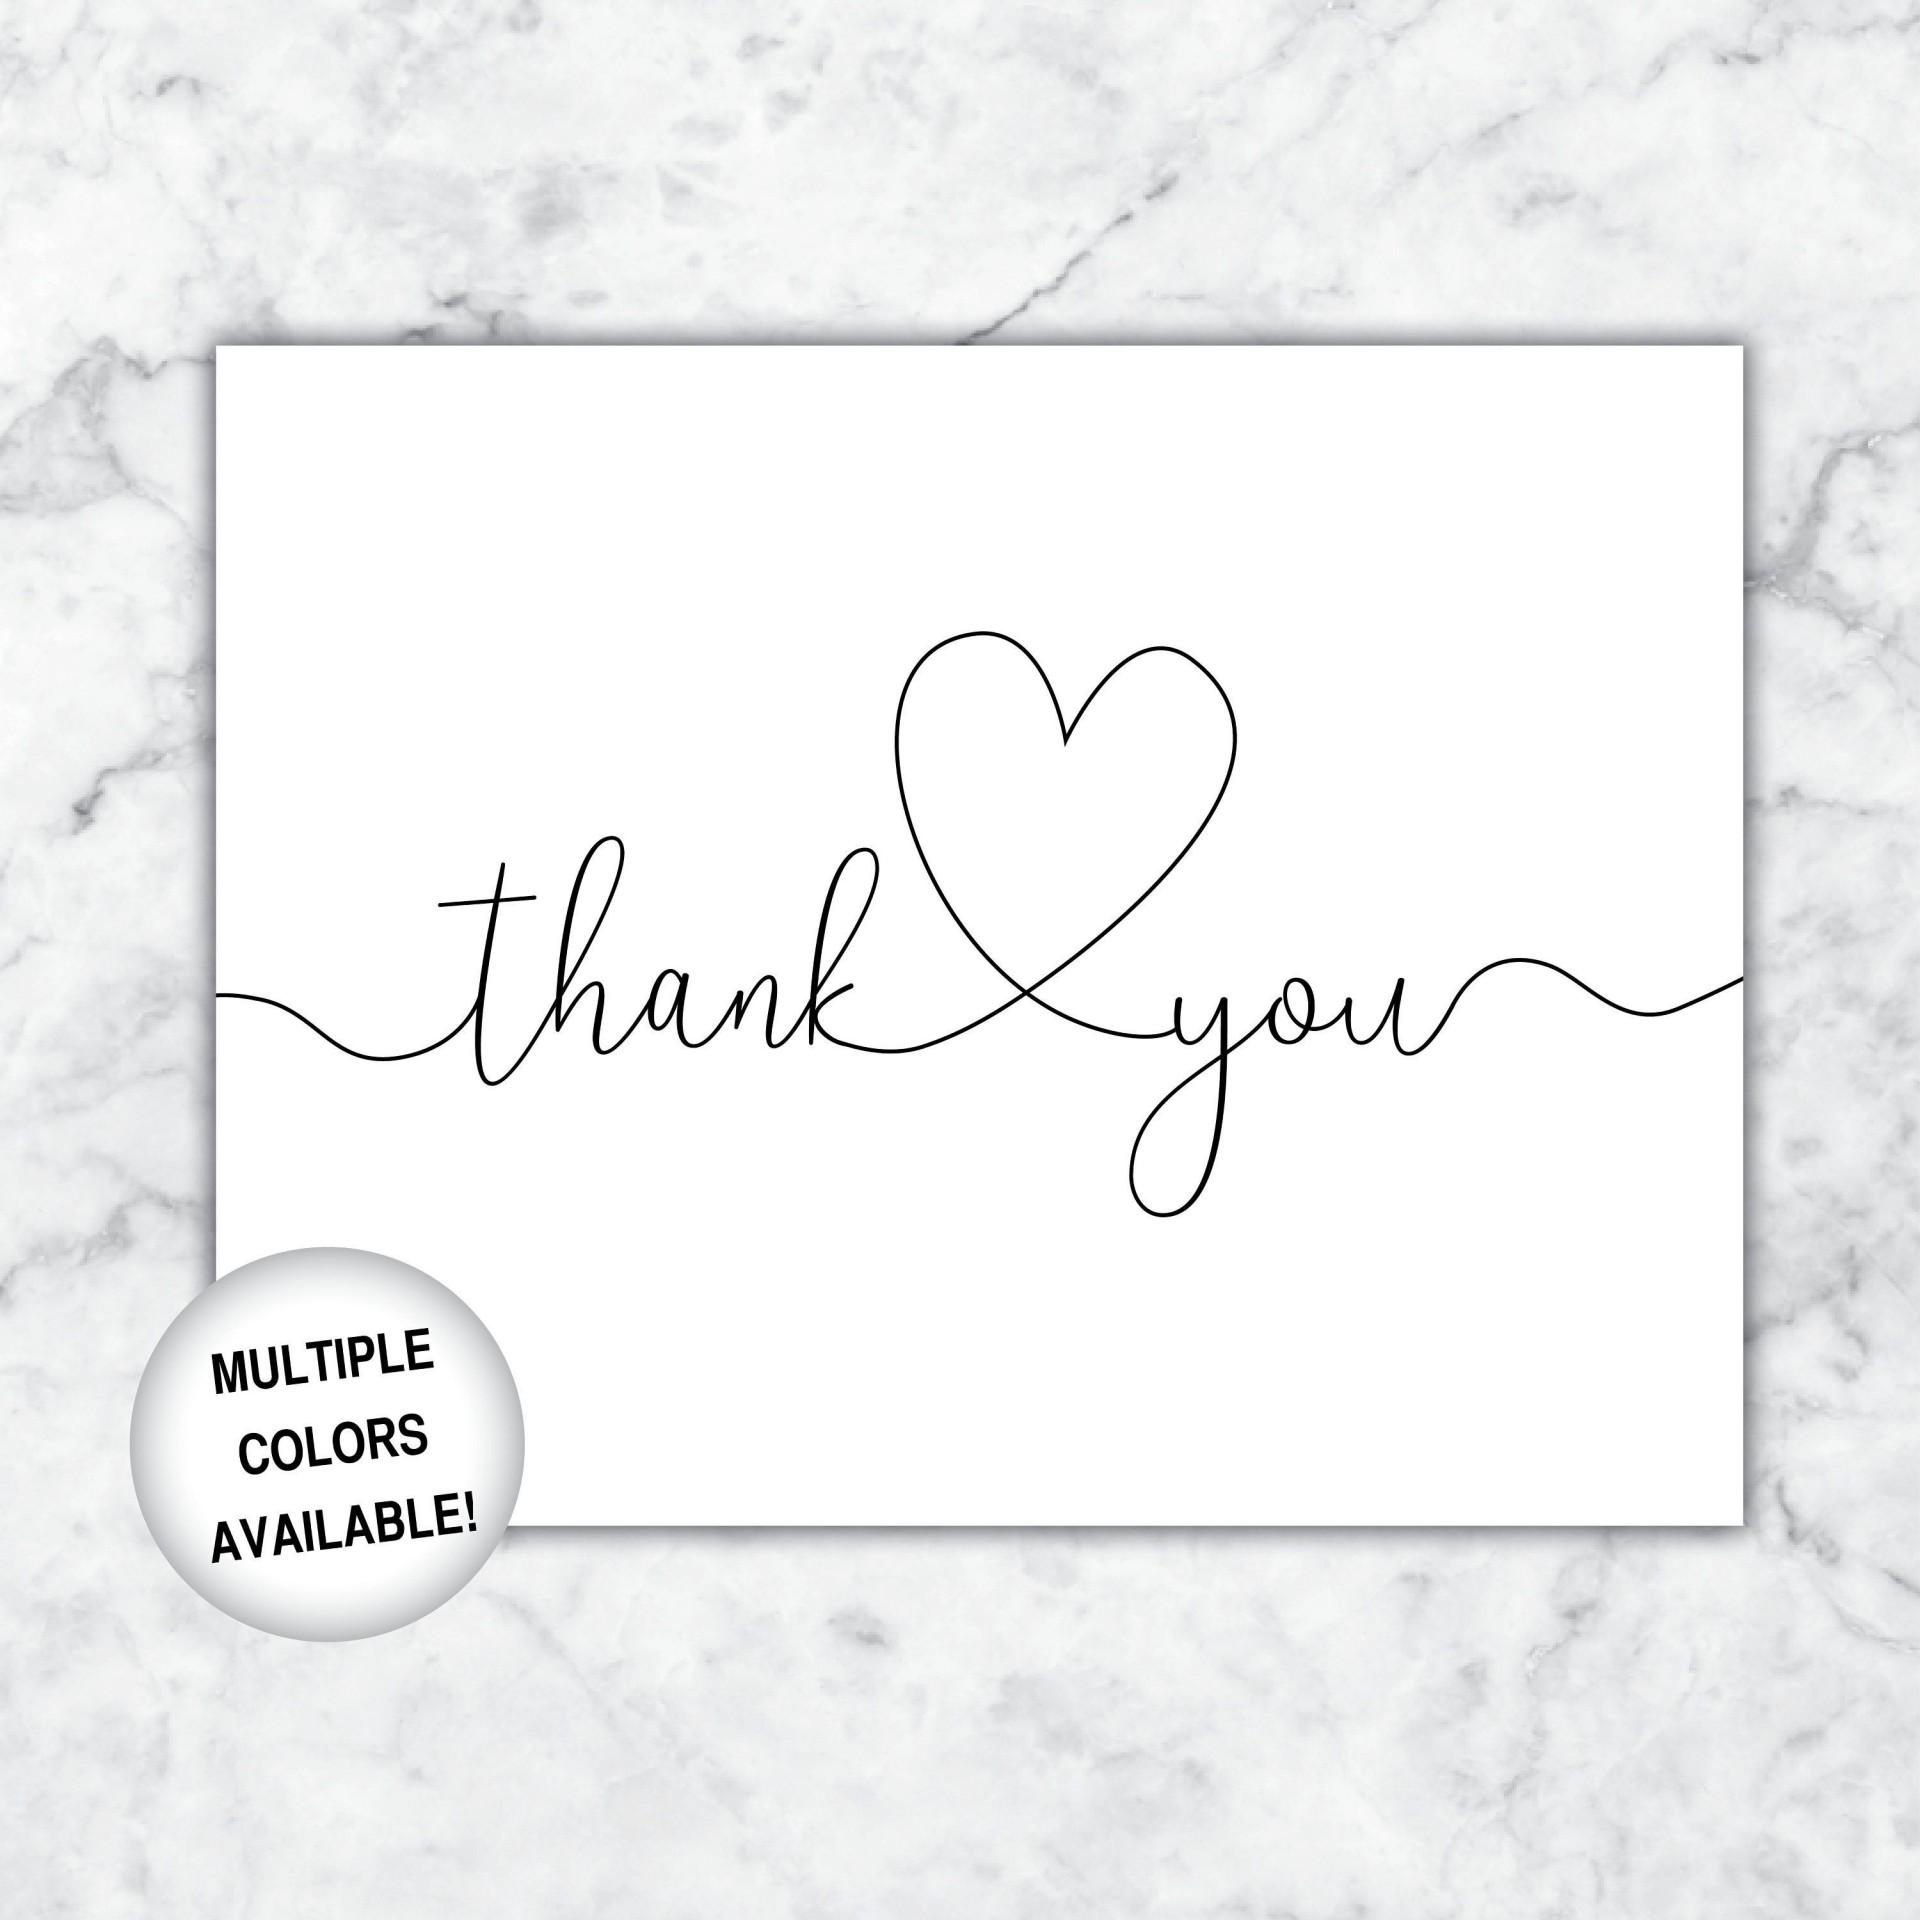 000 Fantastic Thank You Note Template Wedding Shower High Def  Bridal Card Sample Wording1920